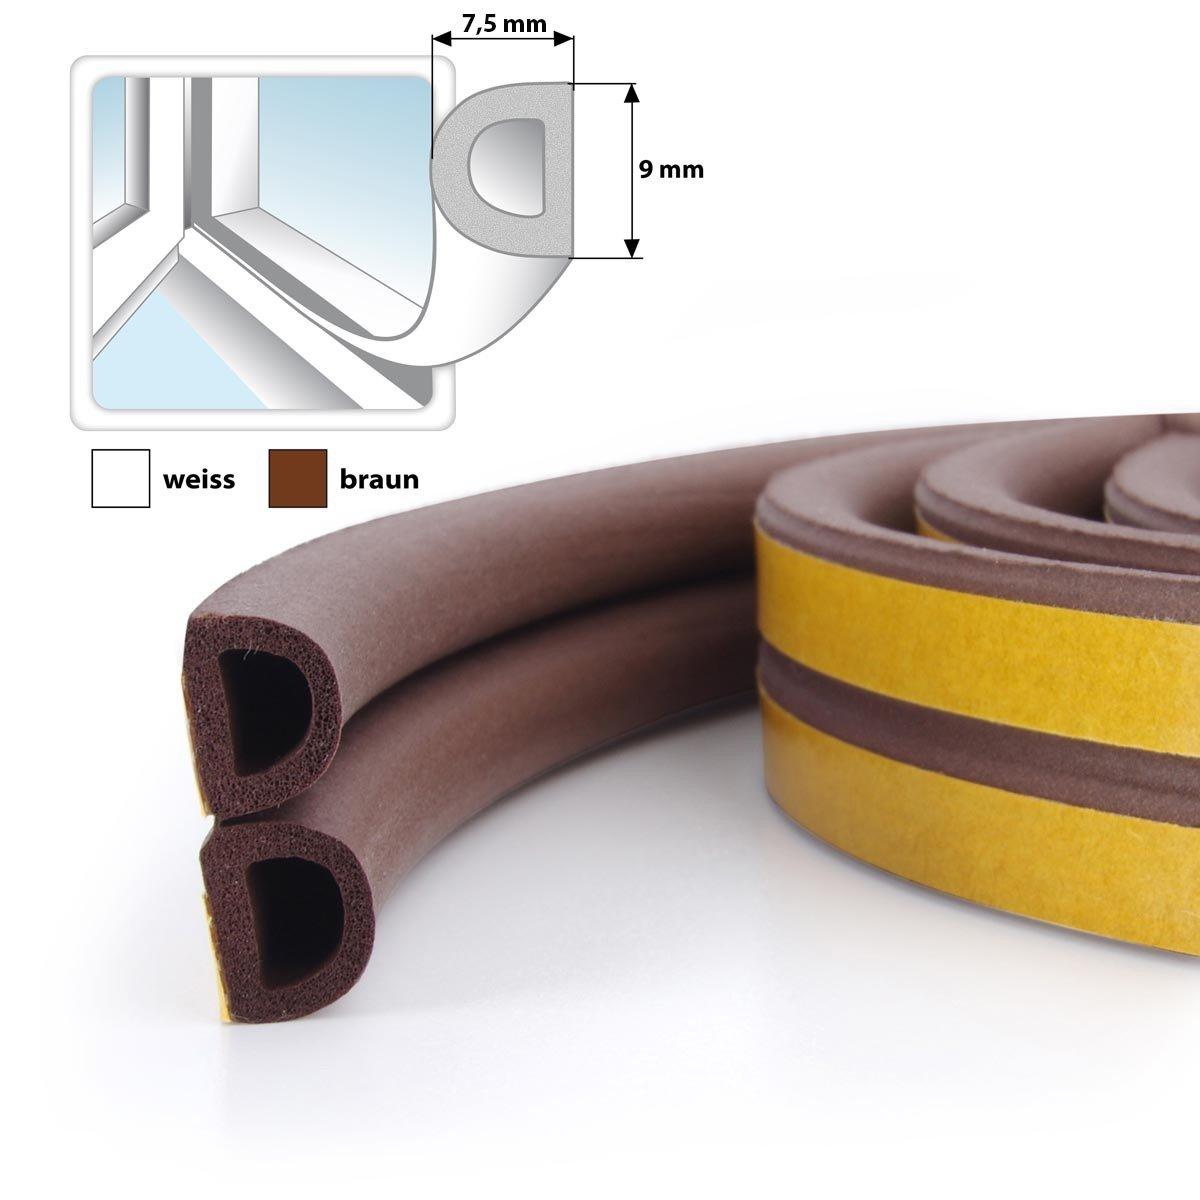 STEIGNER 5 m Self-Adhesive Window And Door Seal Profile D Brown Rubber Seal EPDM Jumbo Shop